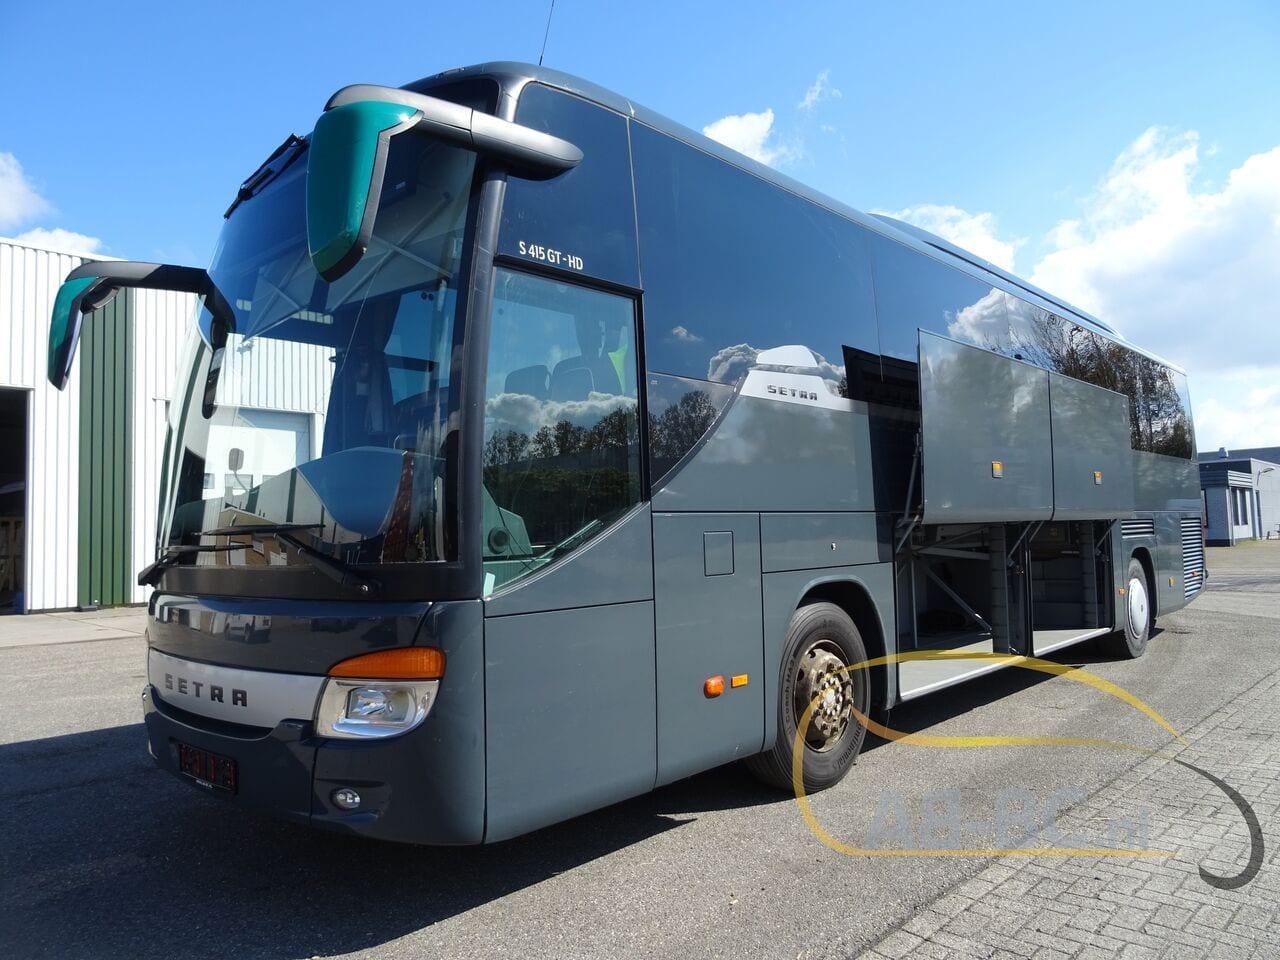 coach-busSETRA-S415-GT-HD-FINAL-EDITION-51-SEATS-LIFTBUS---1620381769075060785_big_74f3b7bdbf1f9baf491673315b01986e--21050713010665719300